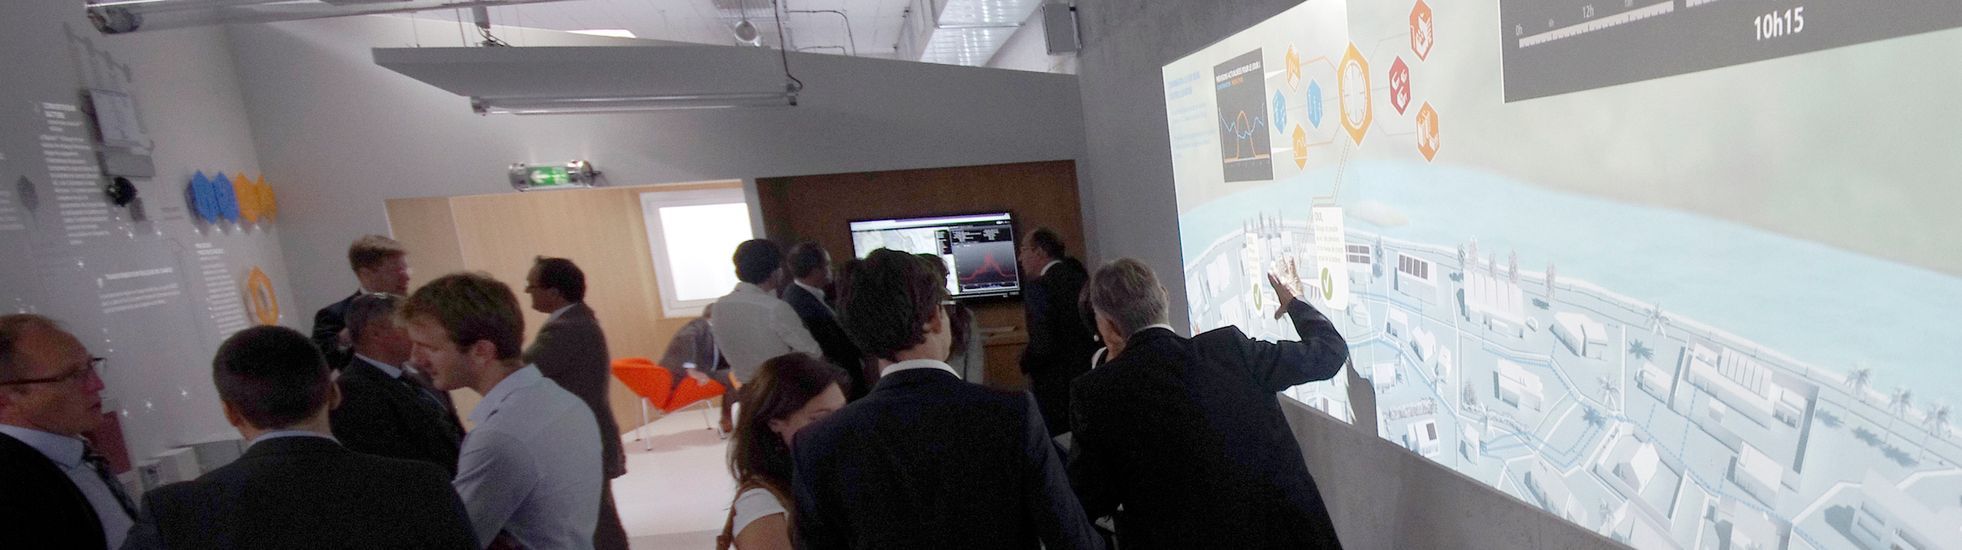 Scénographie showroom interactif